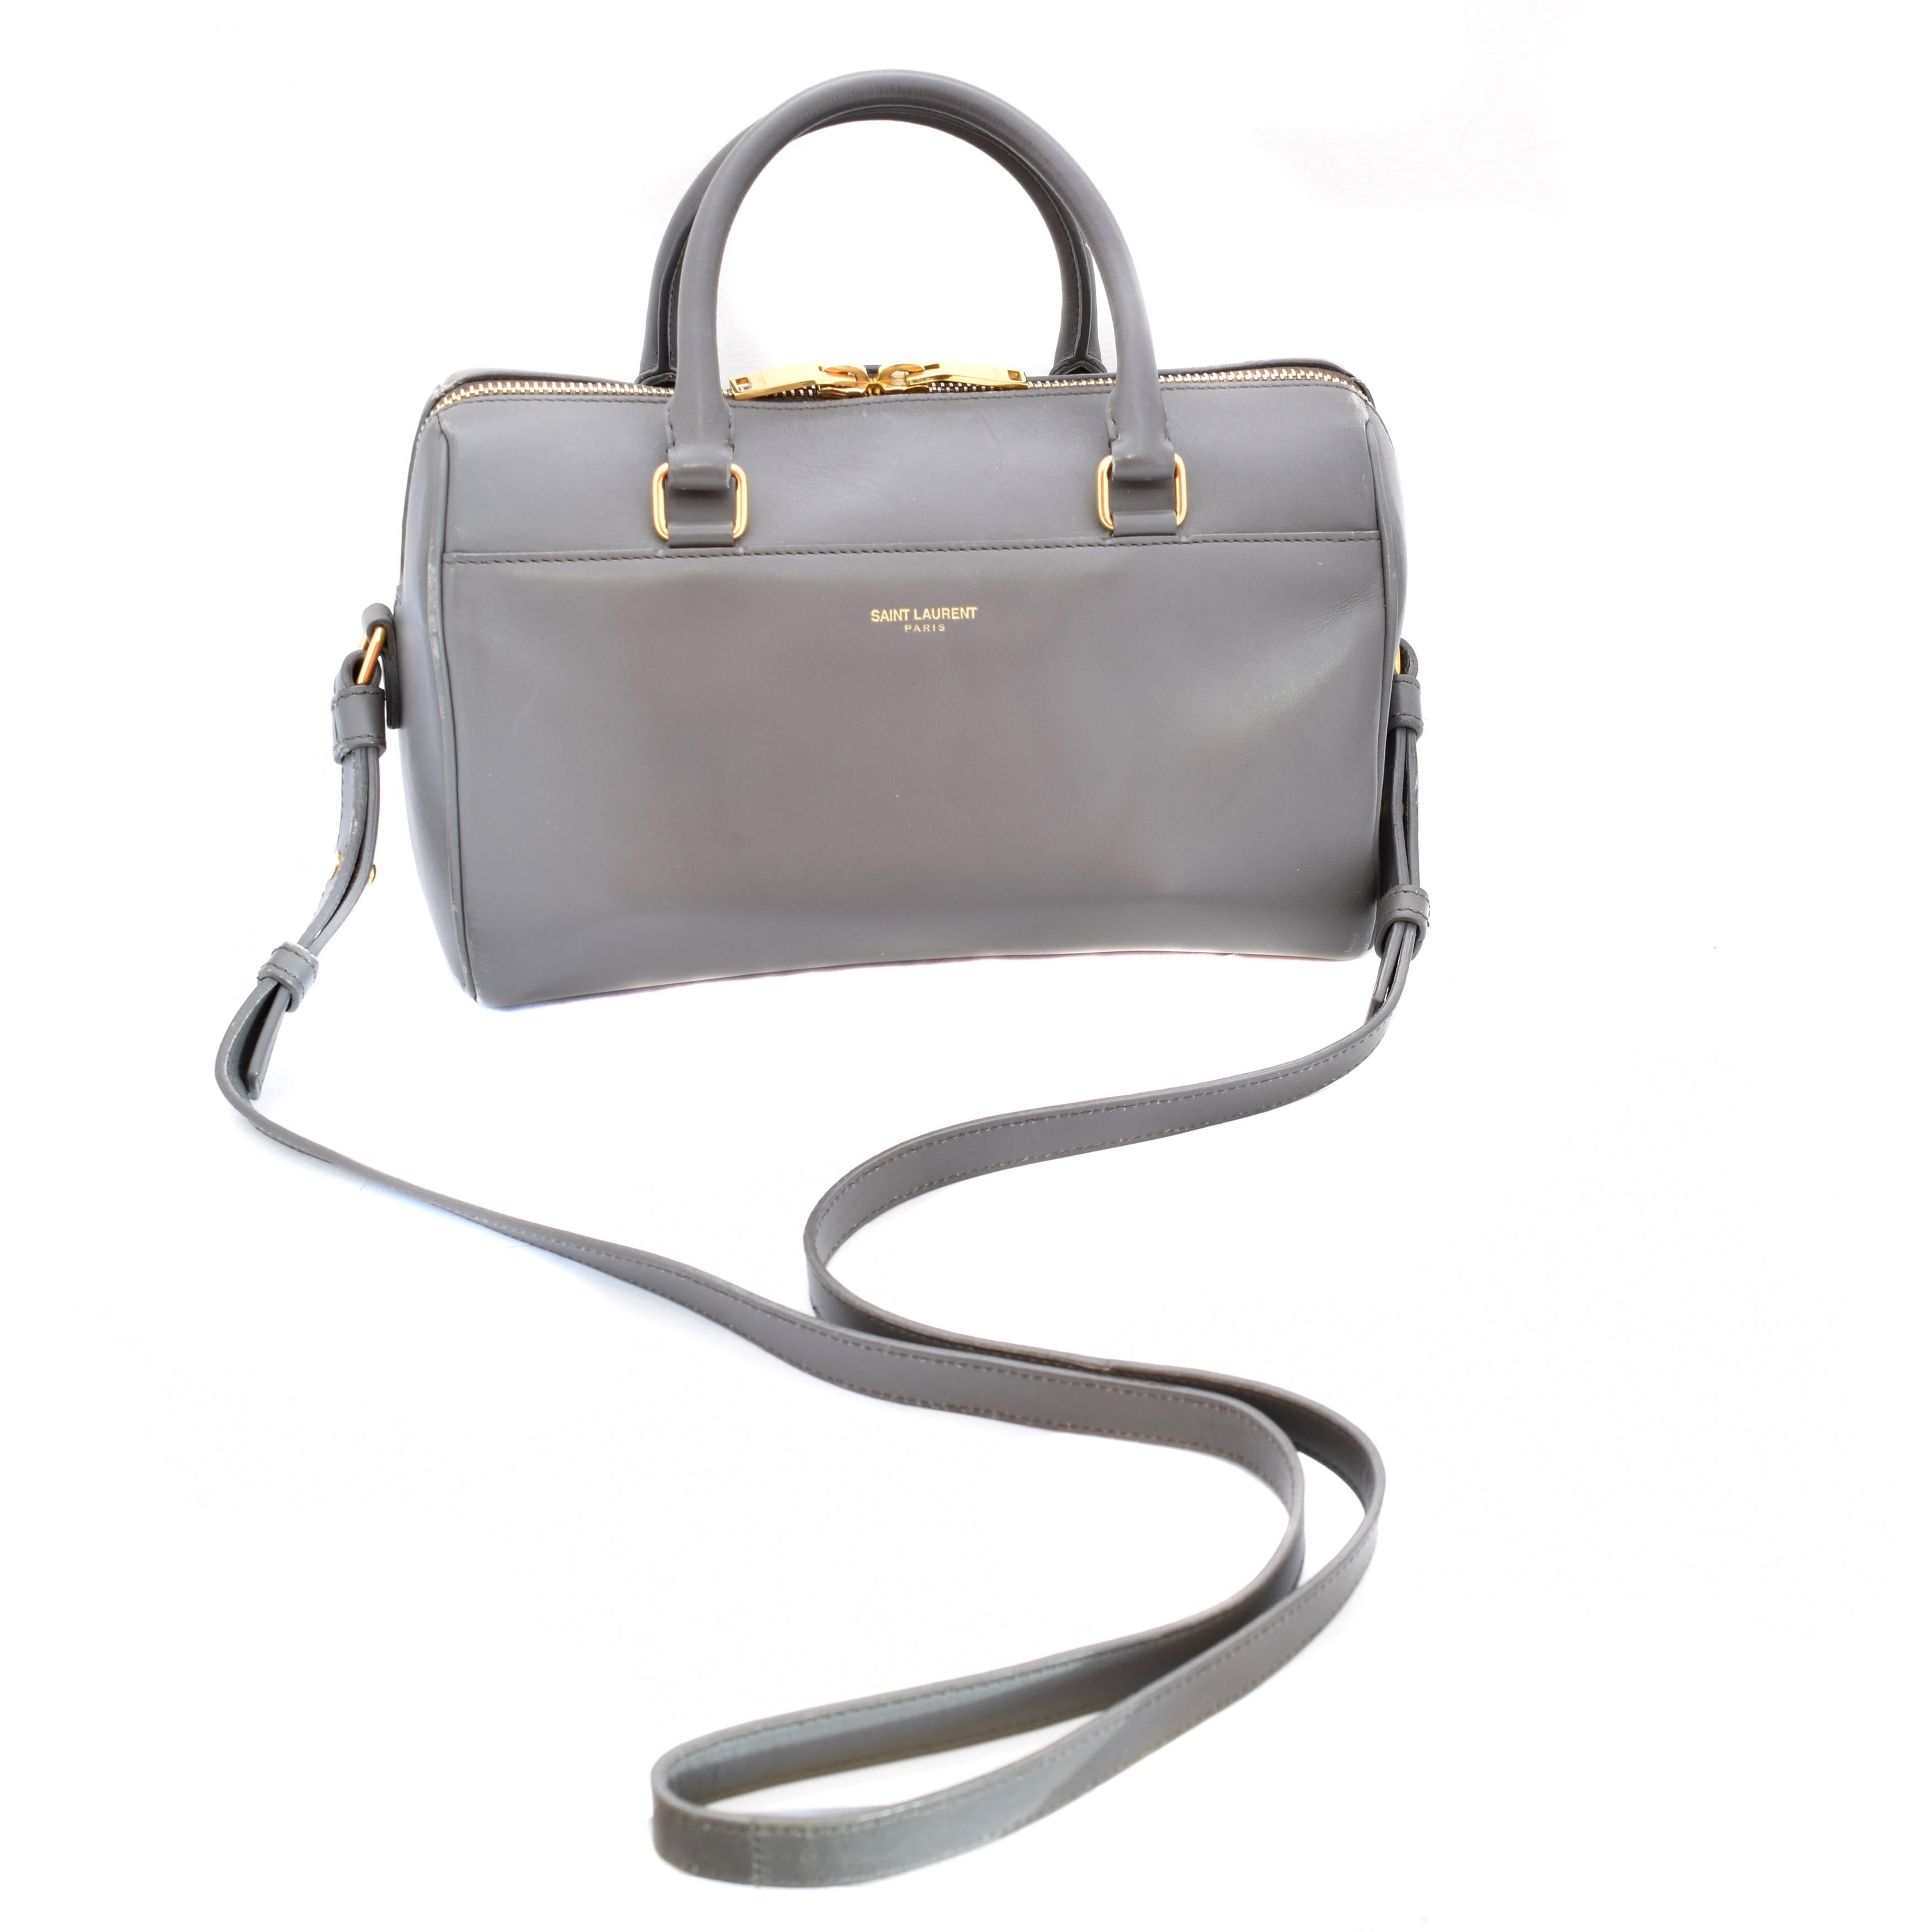 A Yves Saint Laurent Mini Bowling Bag,